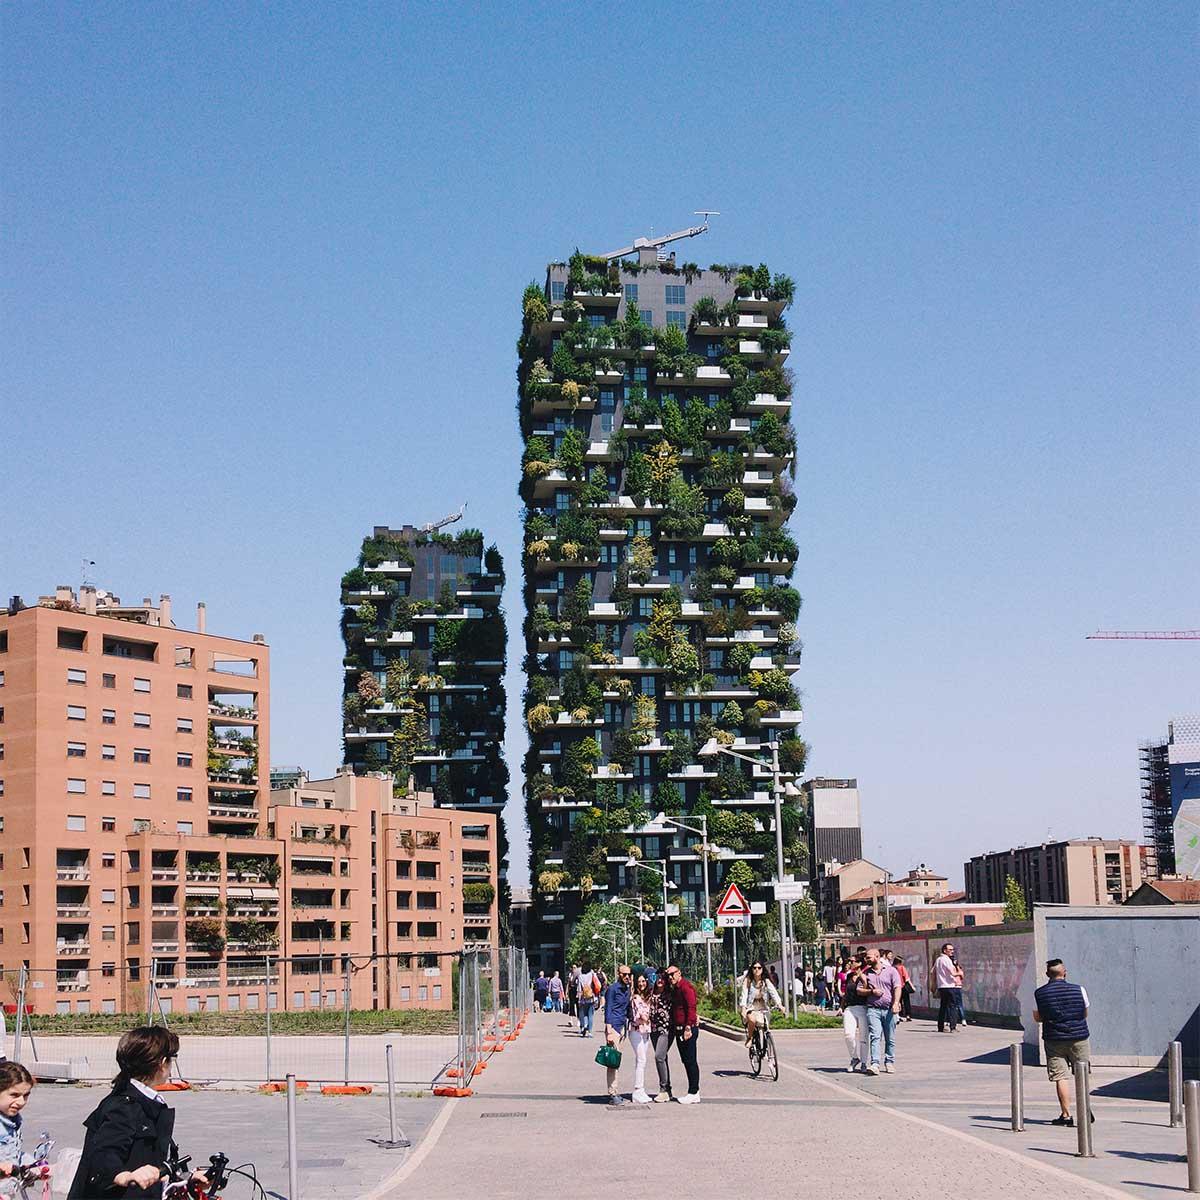 Bosco Verticale, Milano | credits: Alexey Ruban